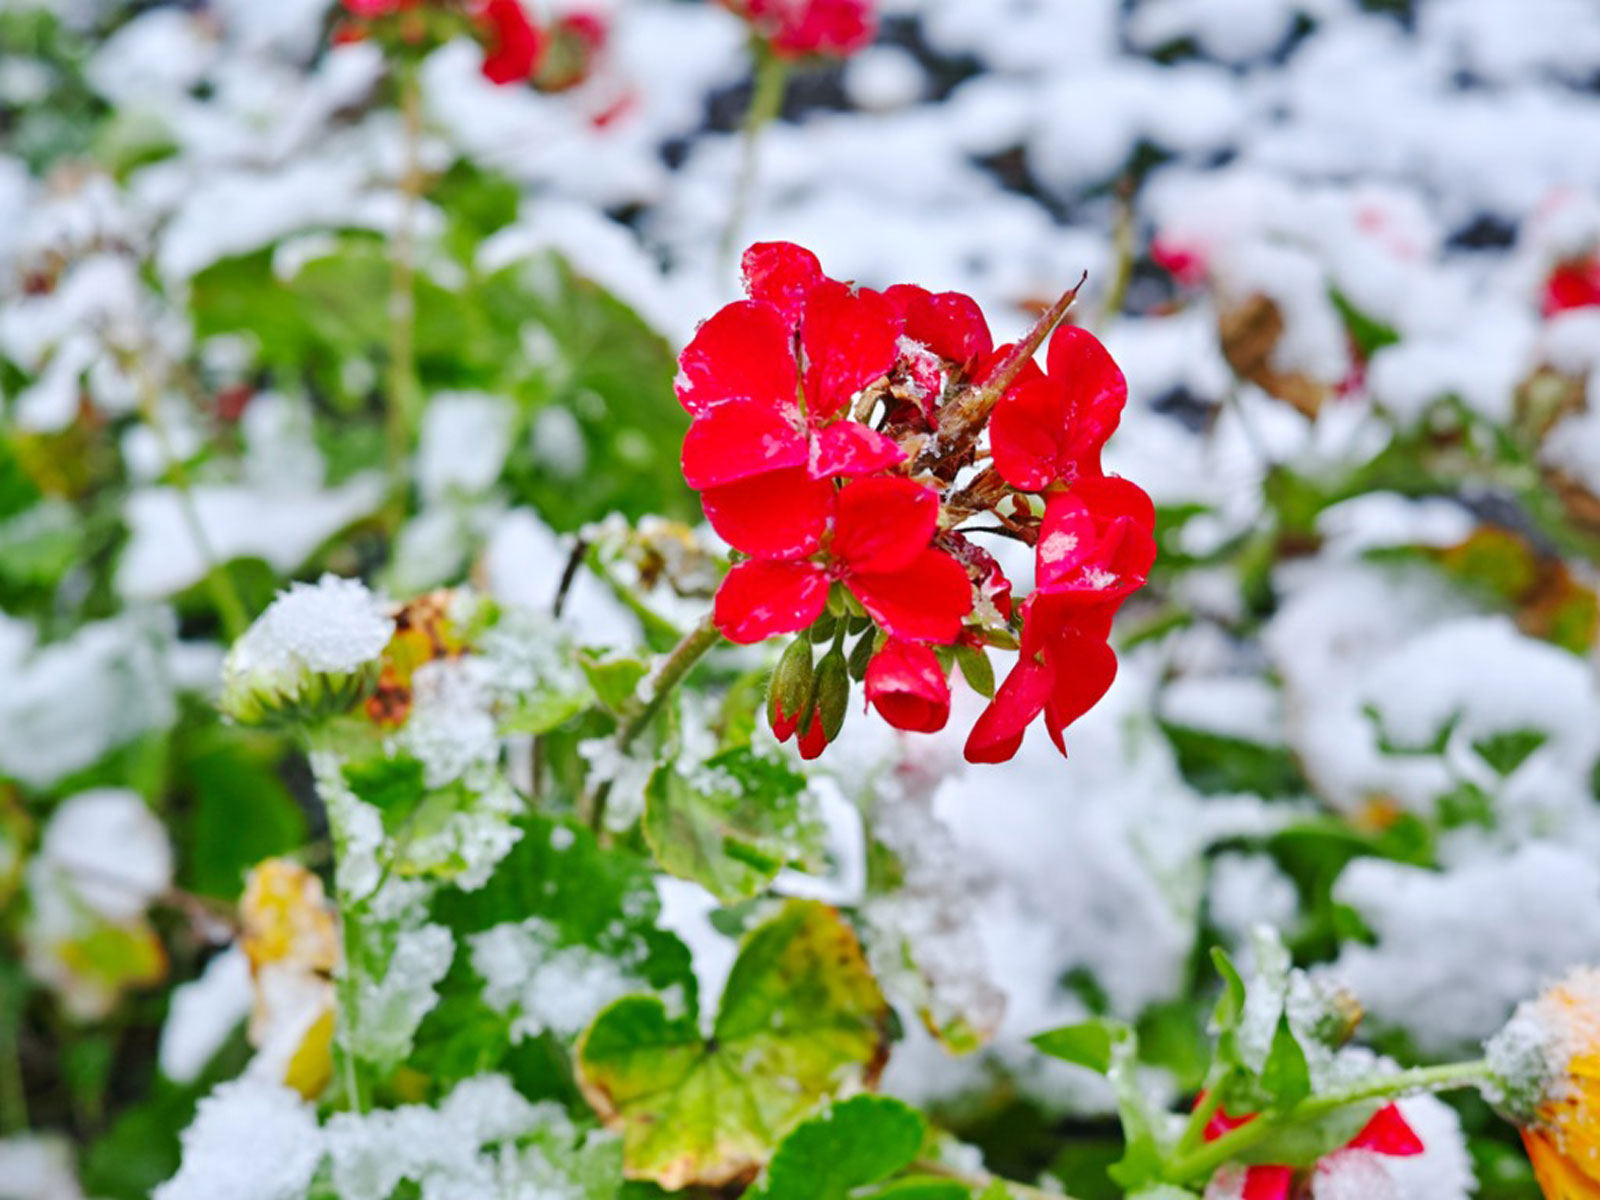 Overwintering Geranium Plant - How To Keep Geraniums Over Winter